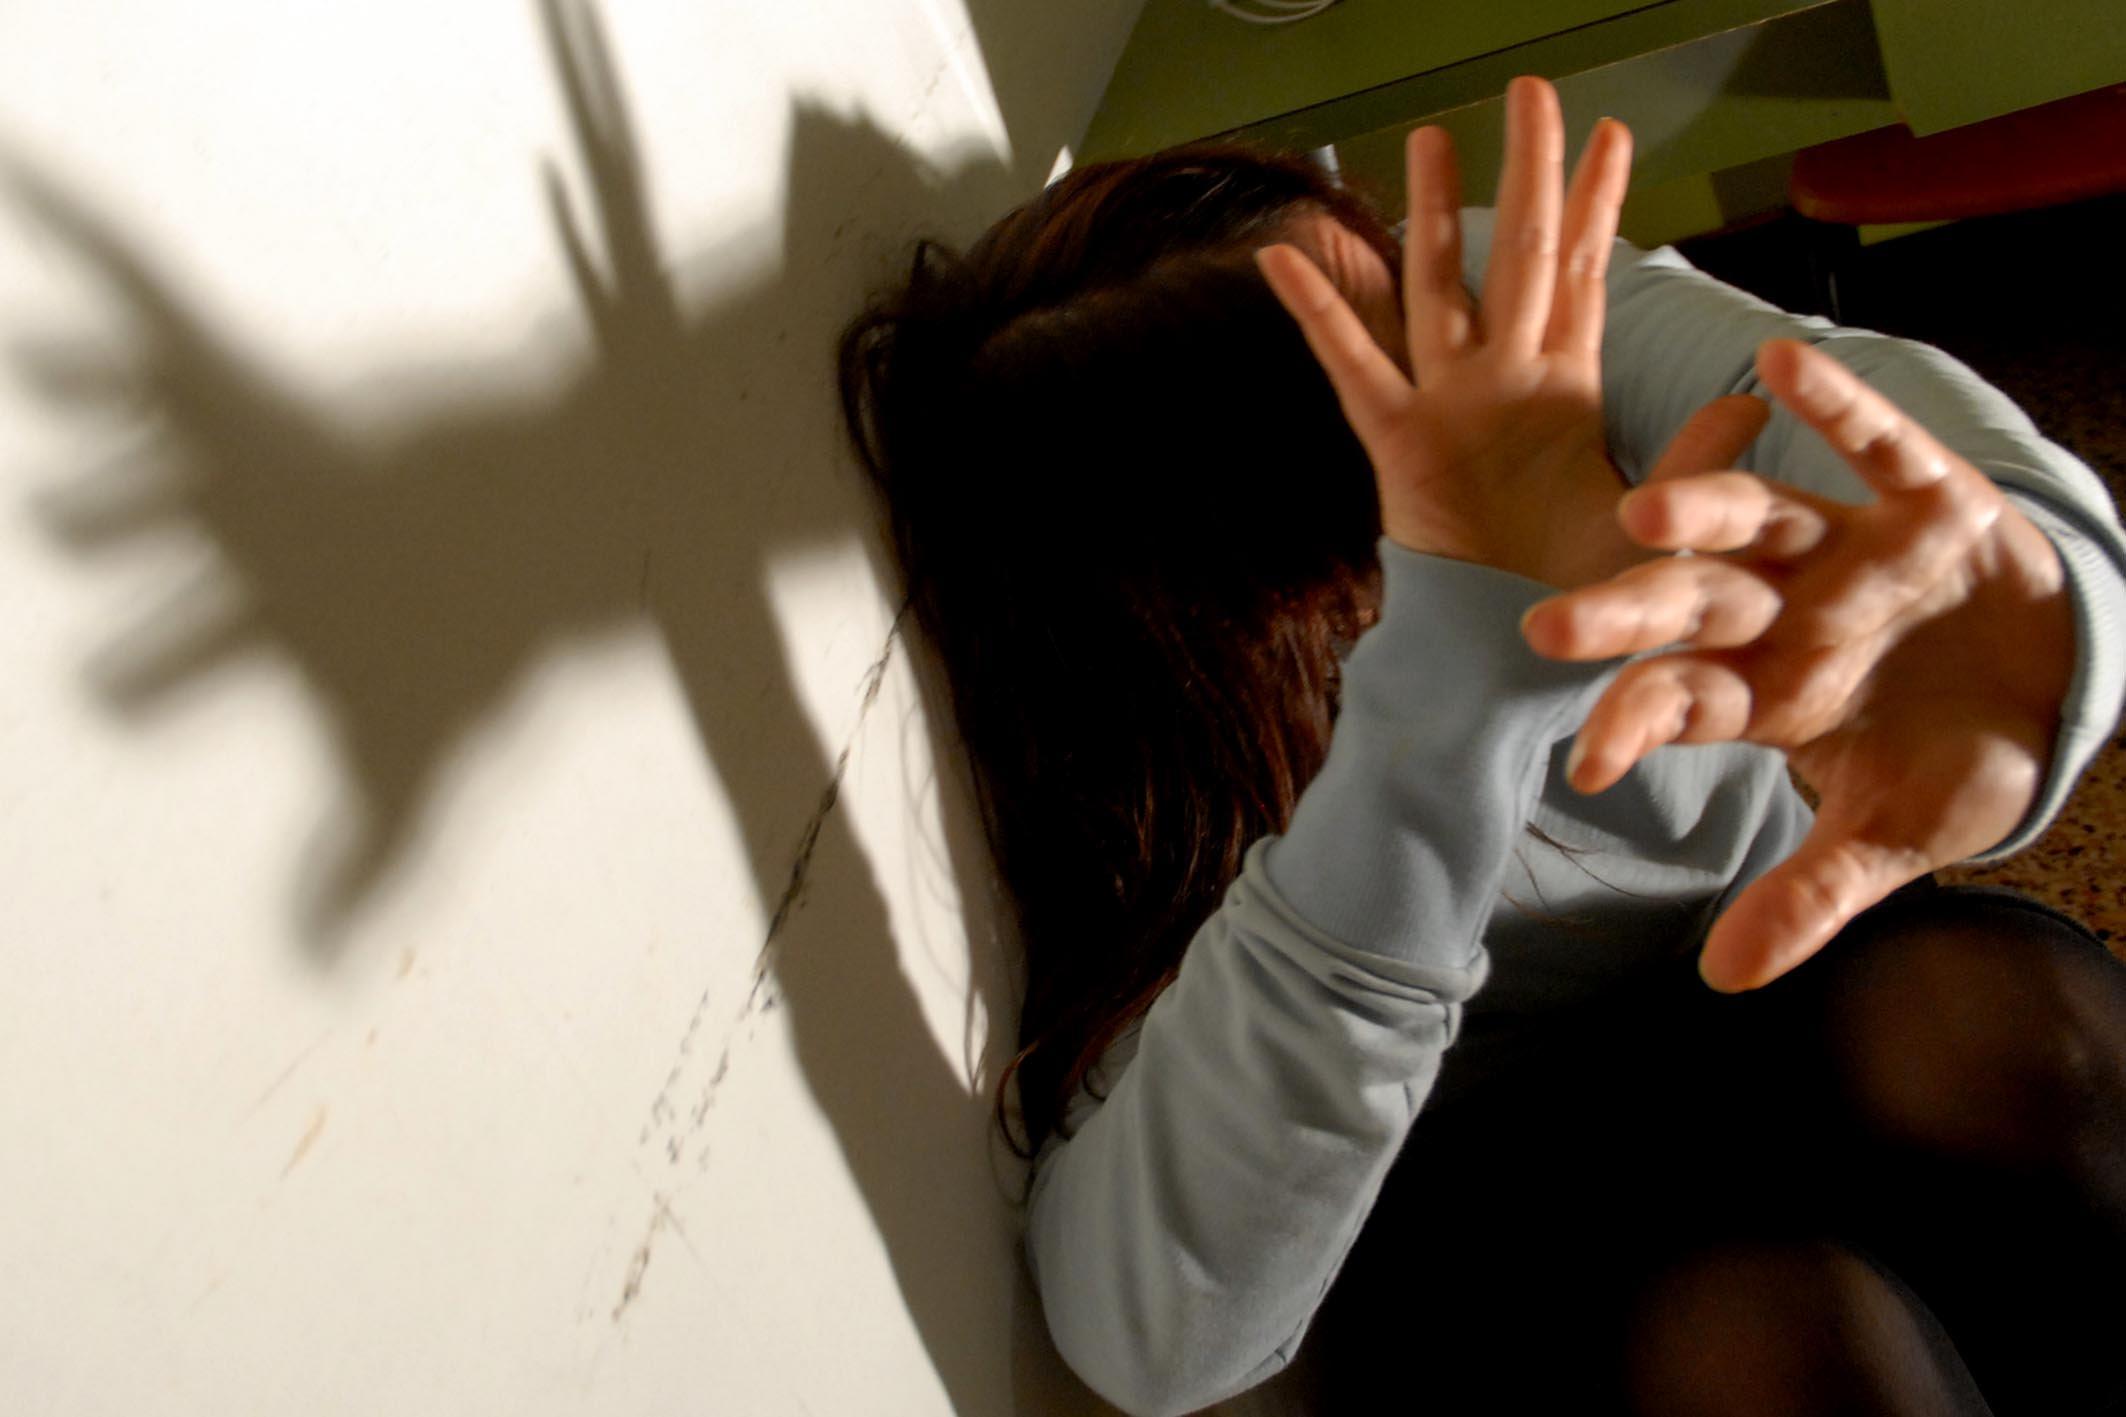 Violenze alle donne, 2 arresti a Messina in altrettante operazioni